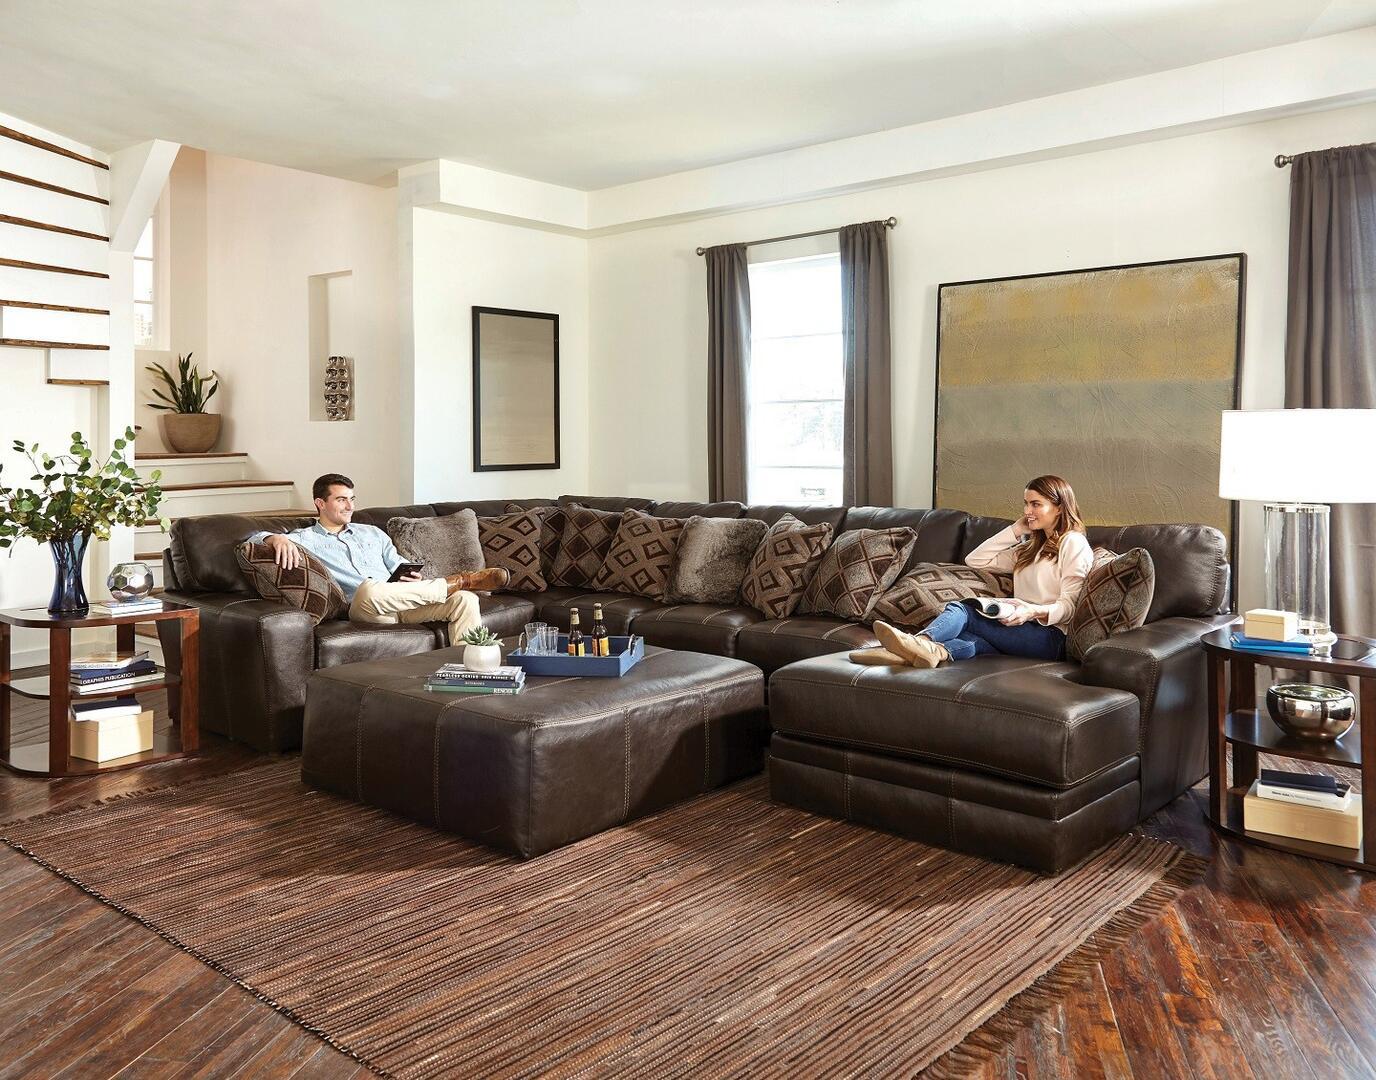 Jackson Furniture 4378623076128309308309 Denali Series Stationary Leather Sofa Appliances